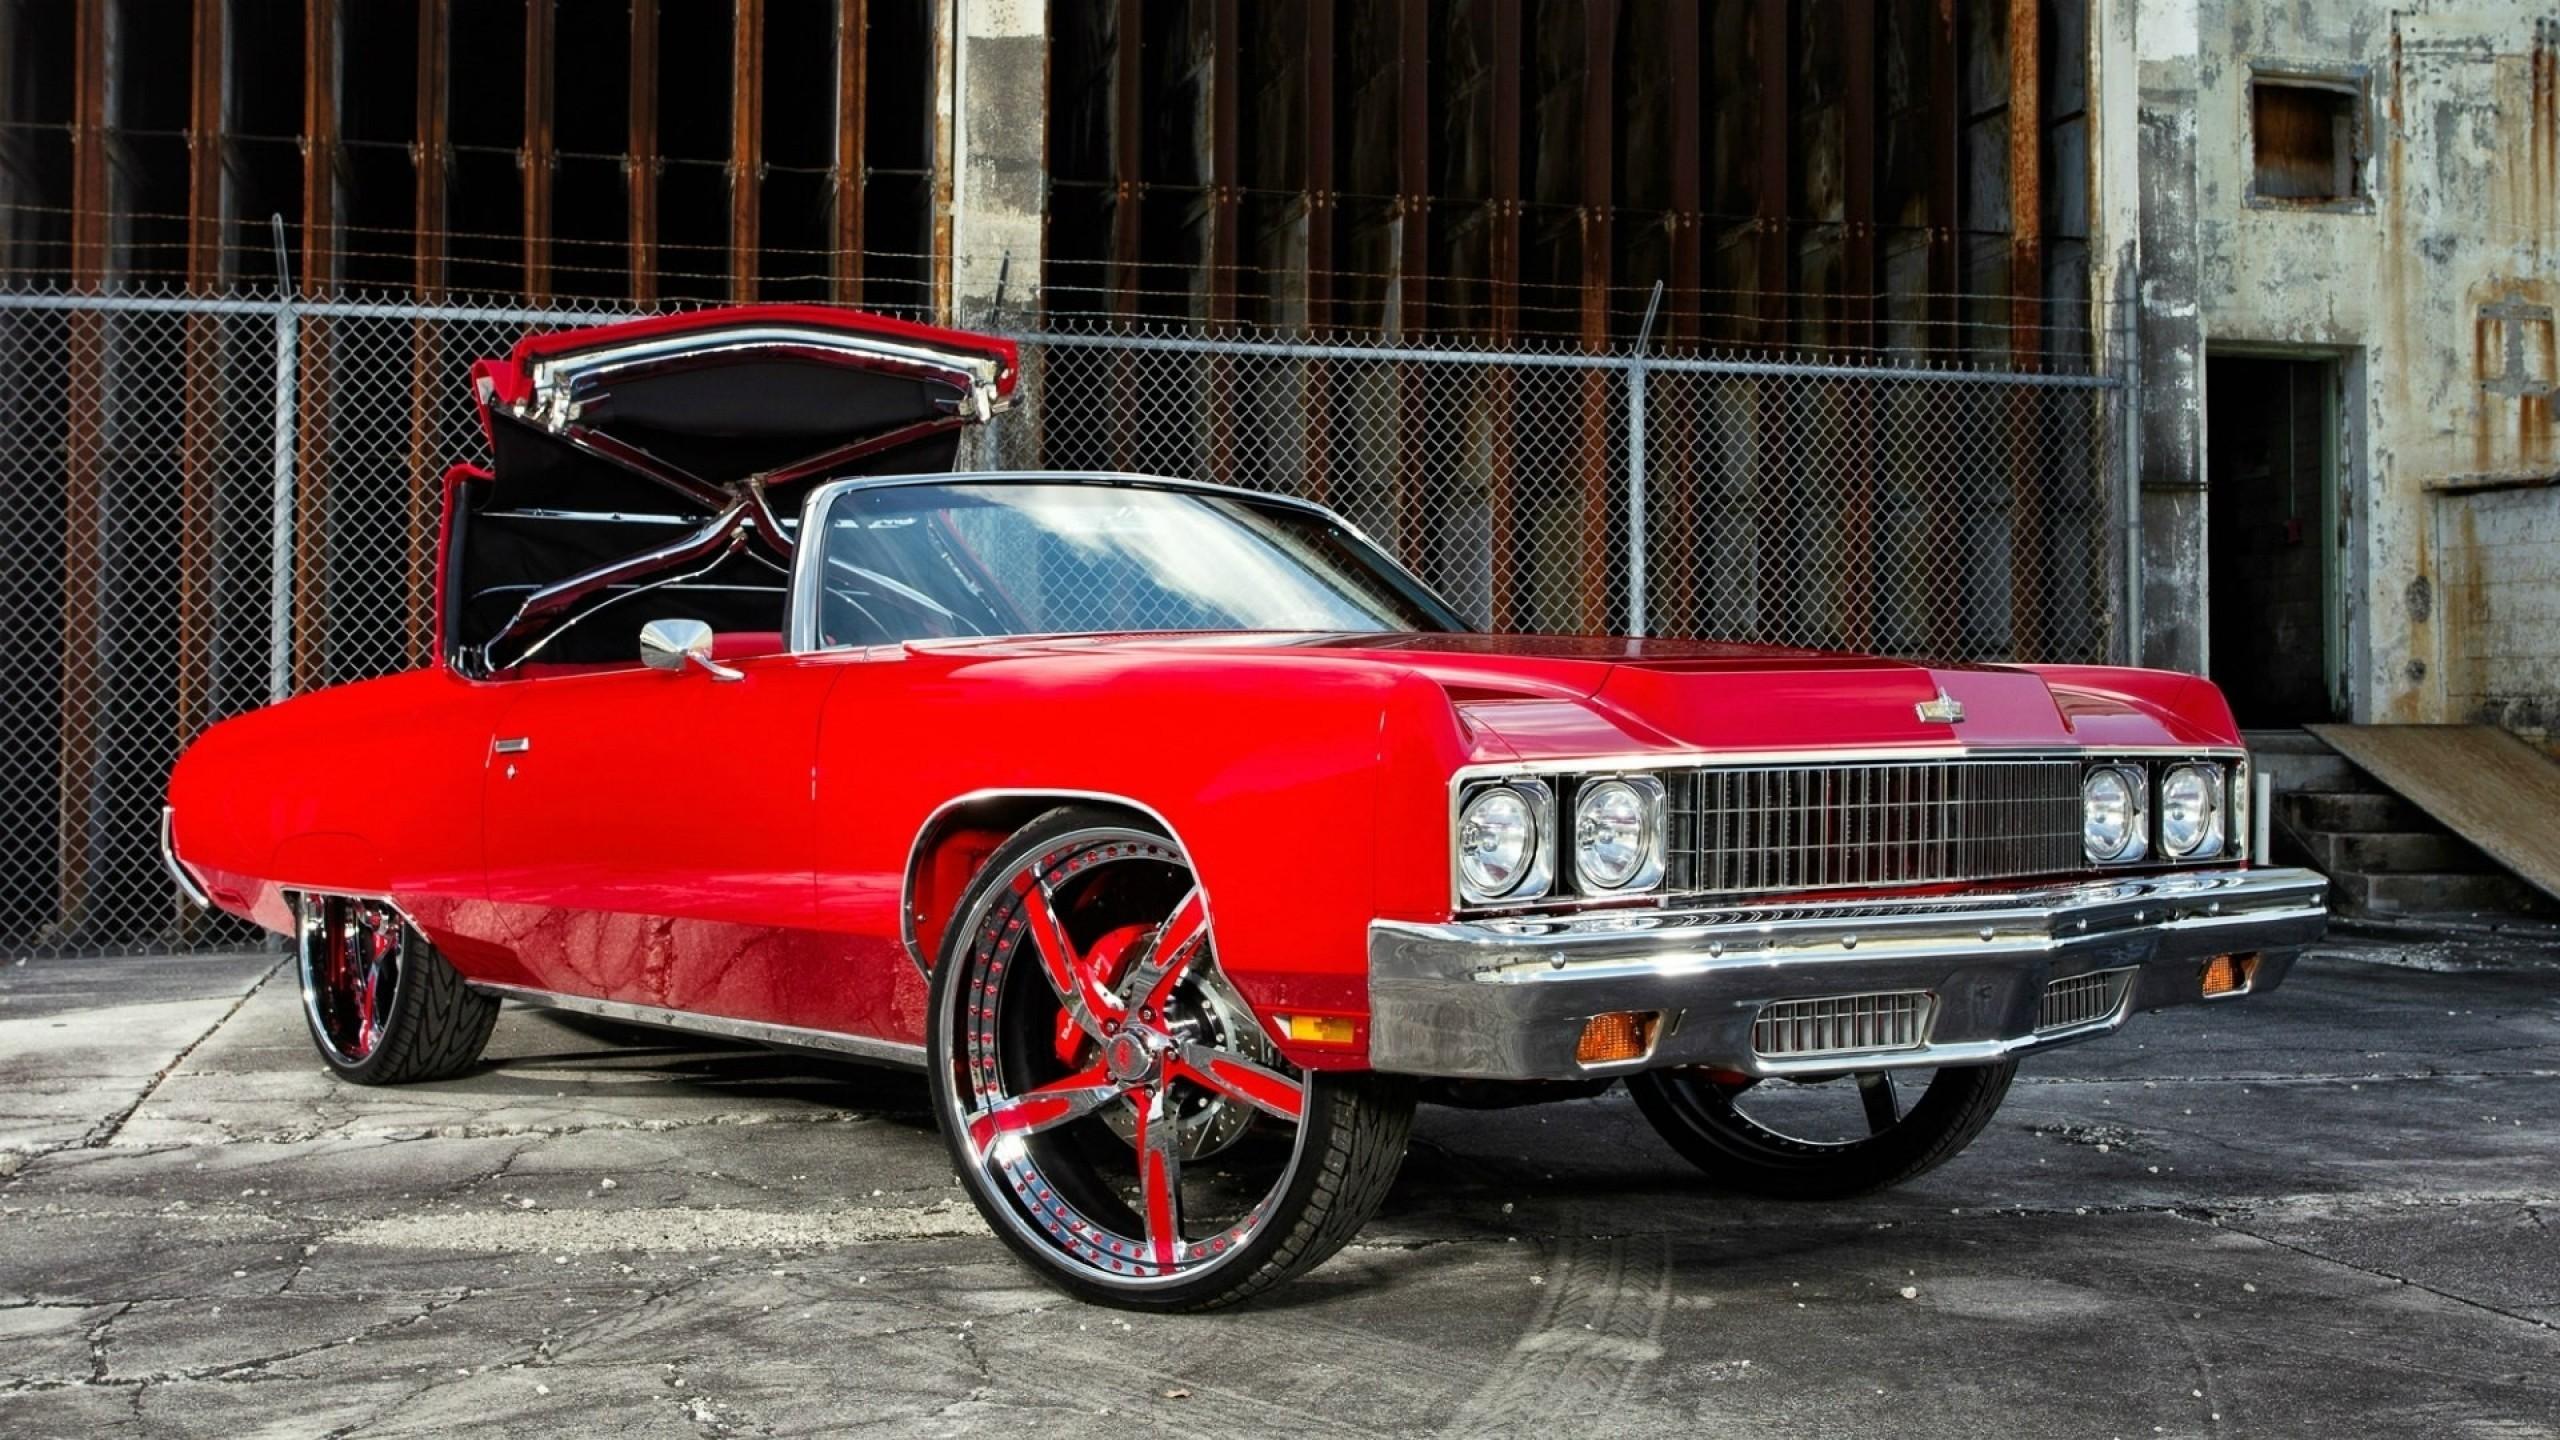 General 2560x1440 car rims red cars